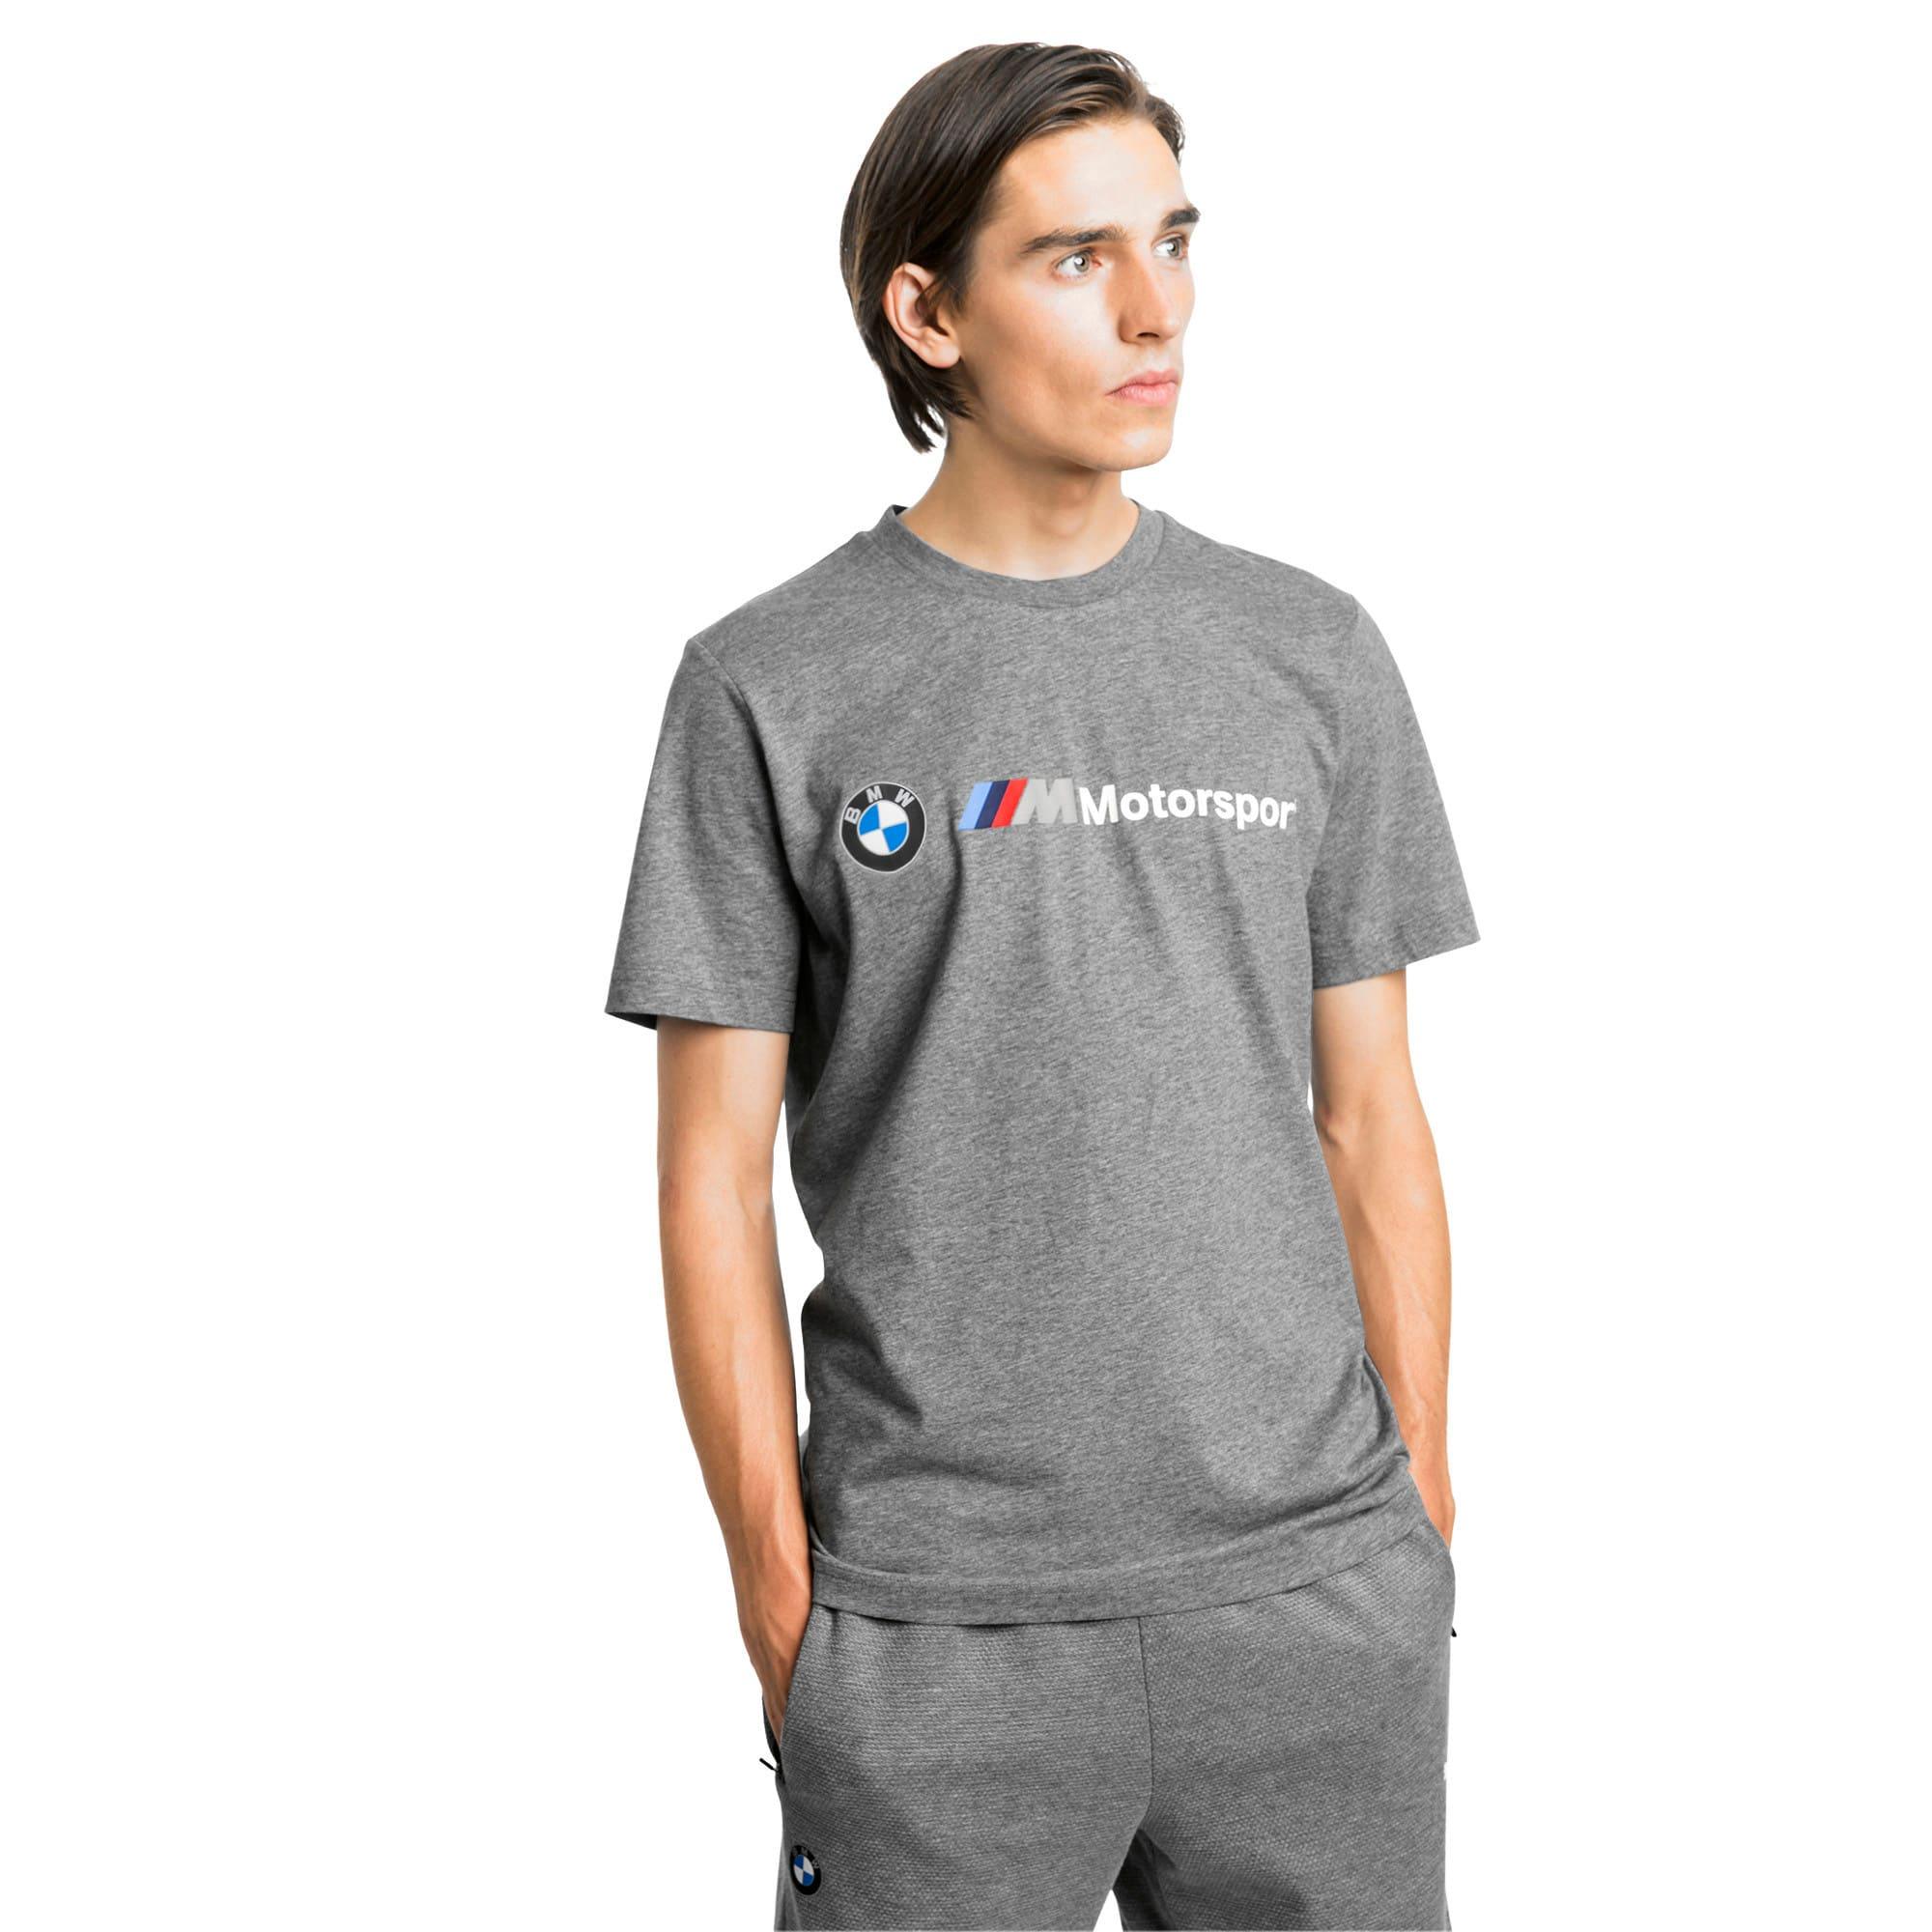 Thumbnail 2 of BMW M Motorsport Men's Logo Tee, Medium Gray Heather, medium